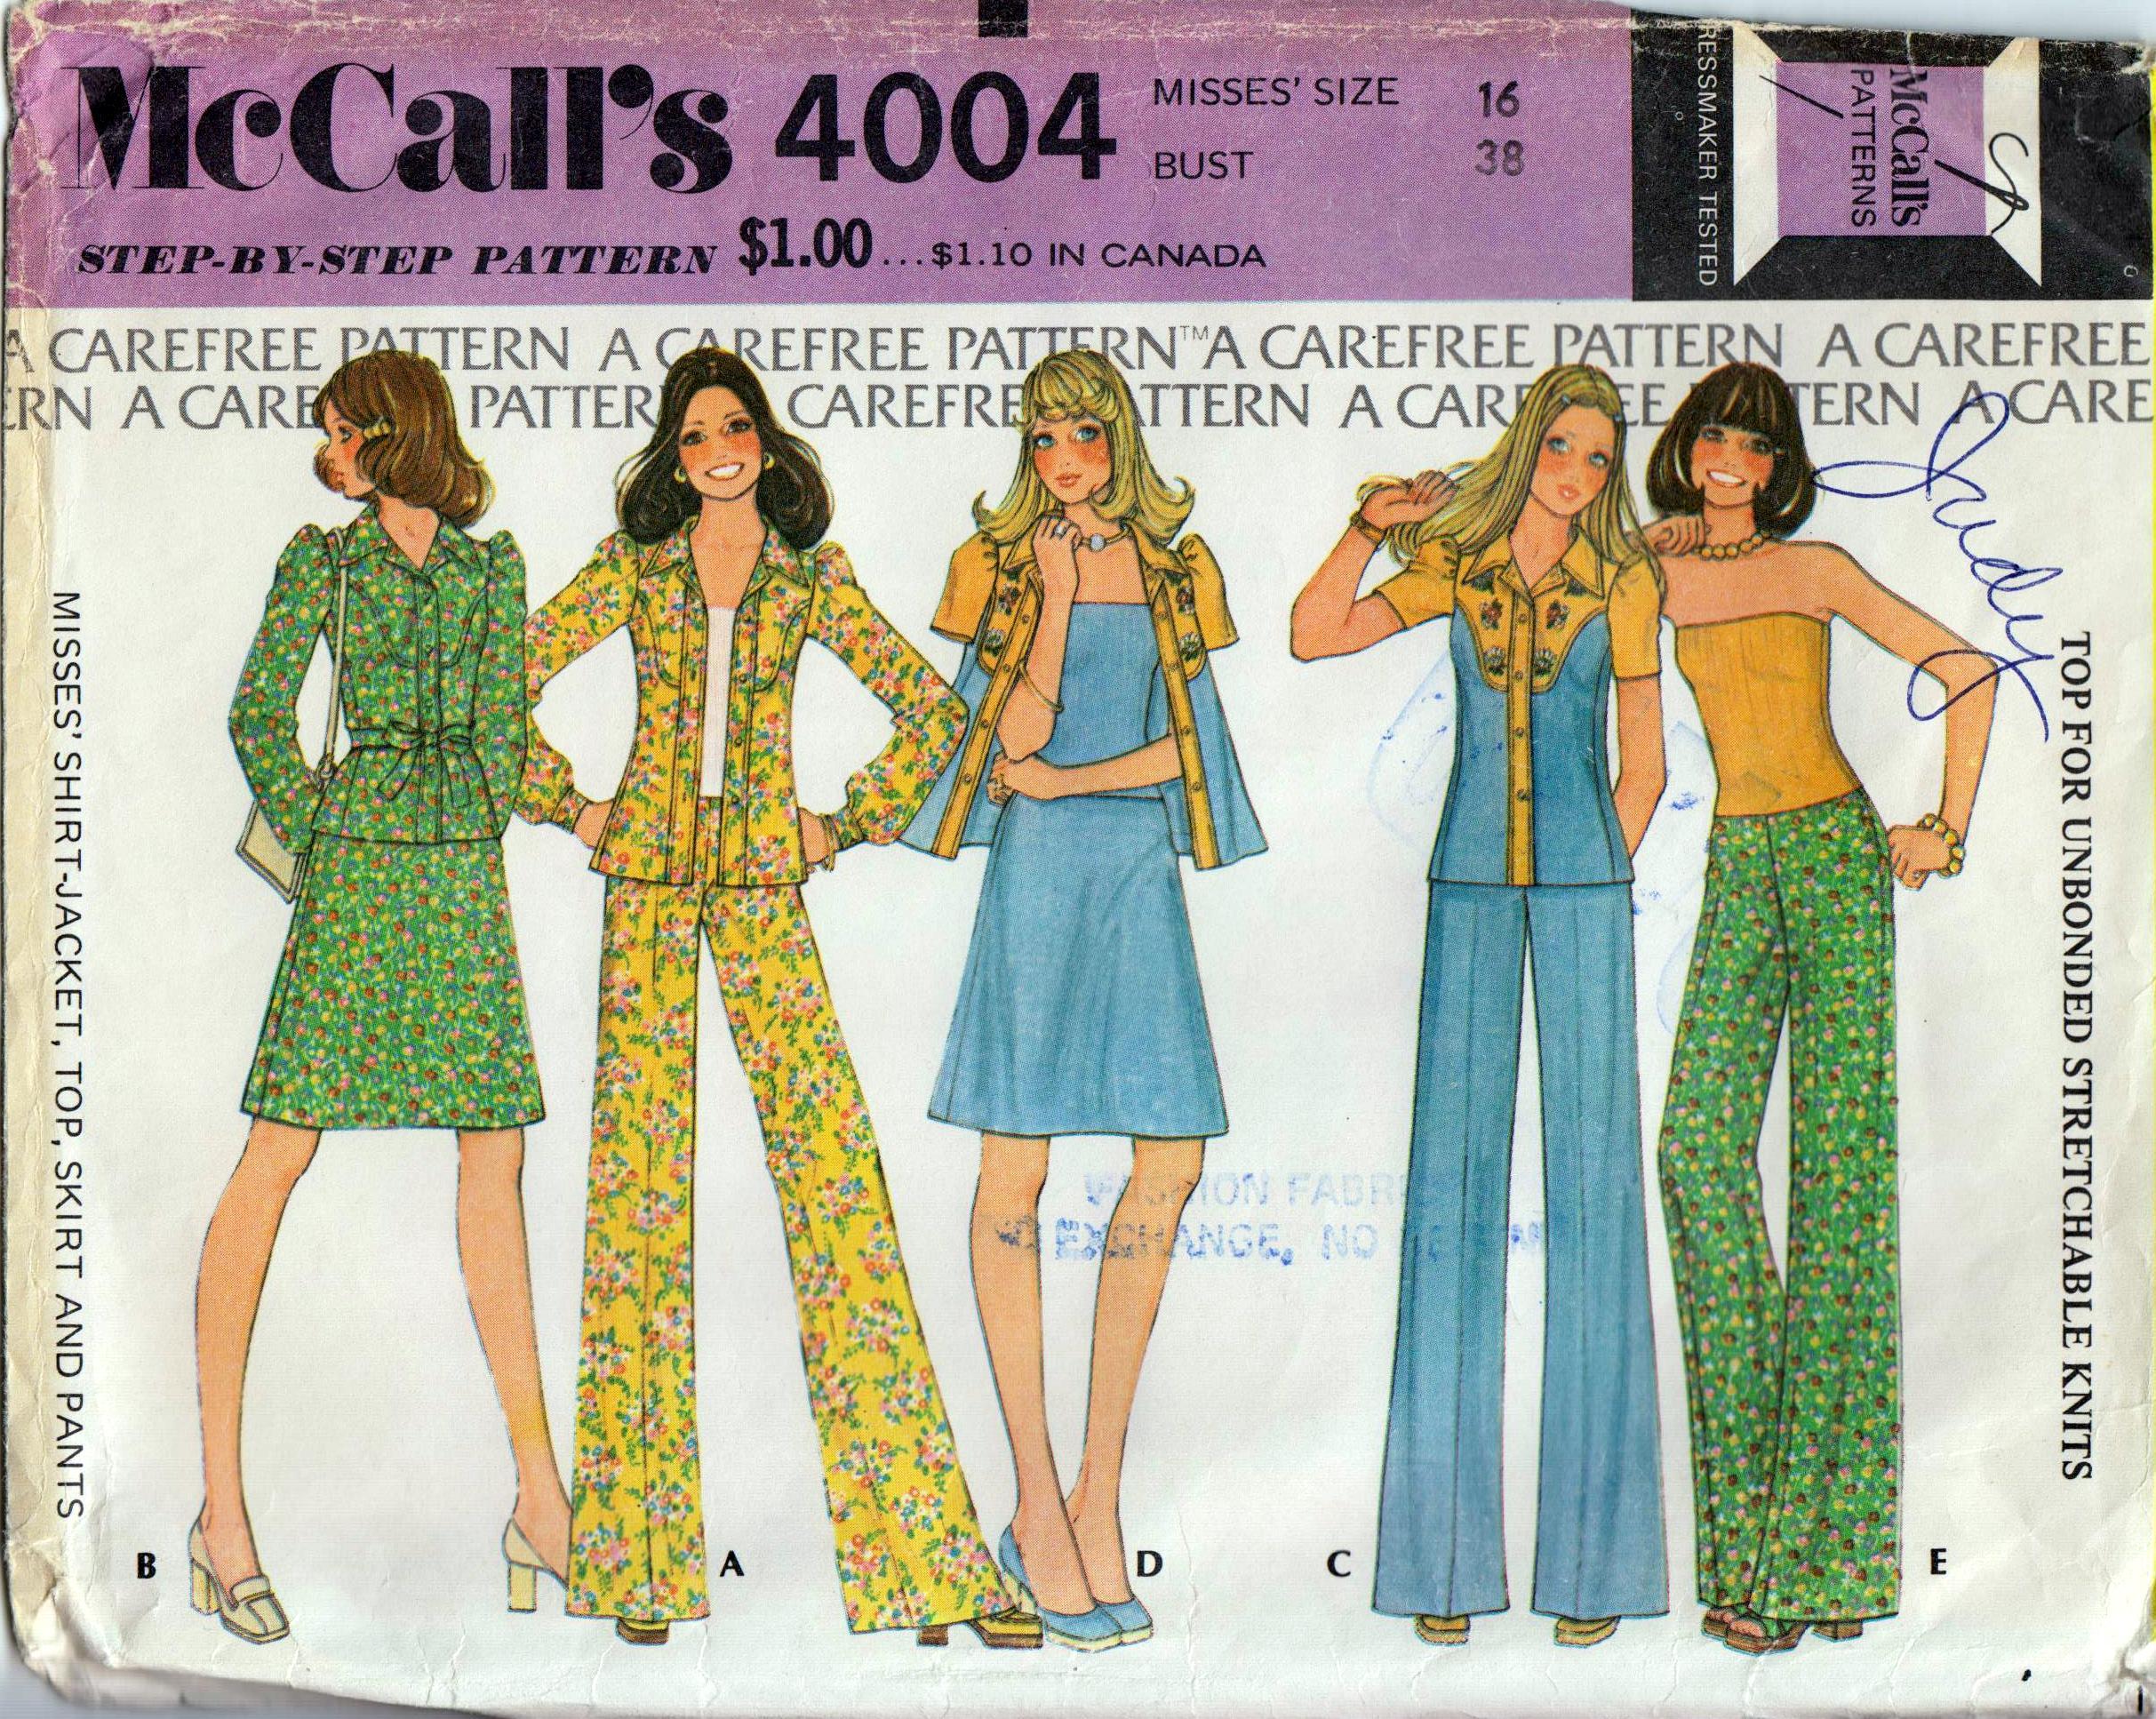 McCall's 4004